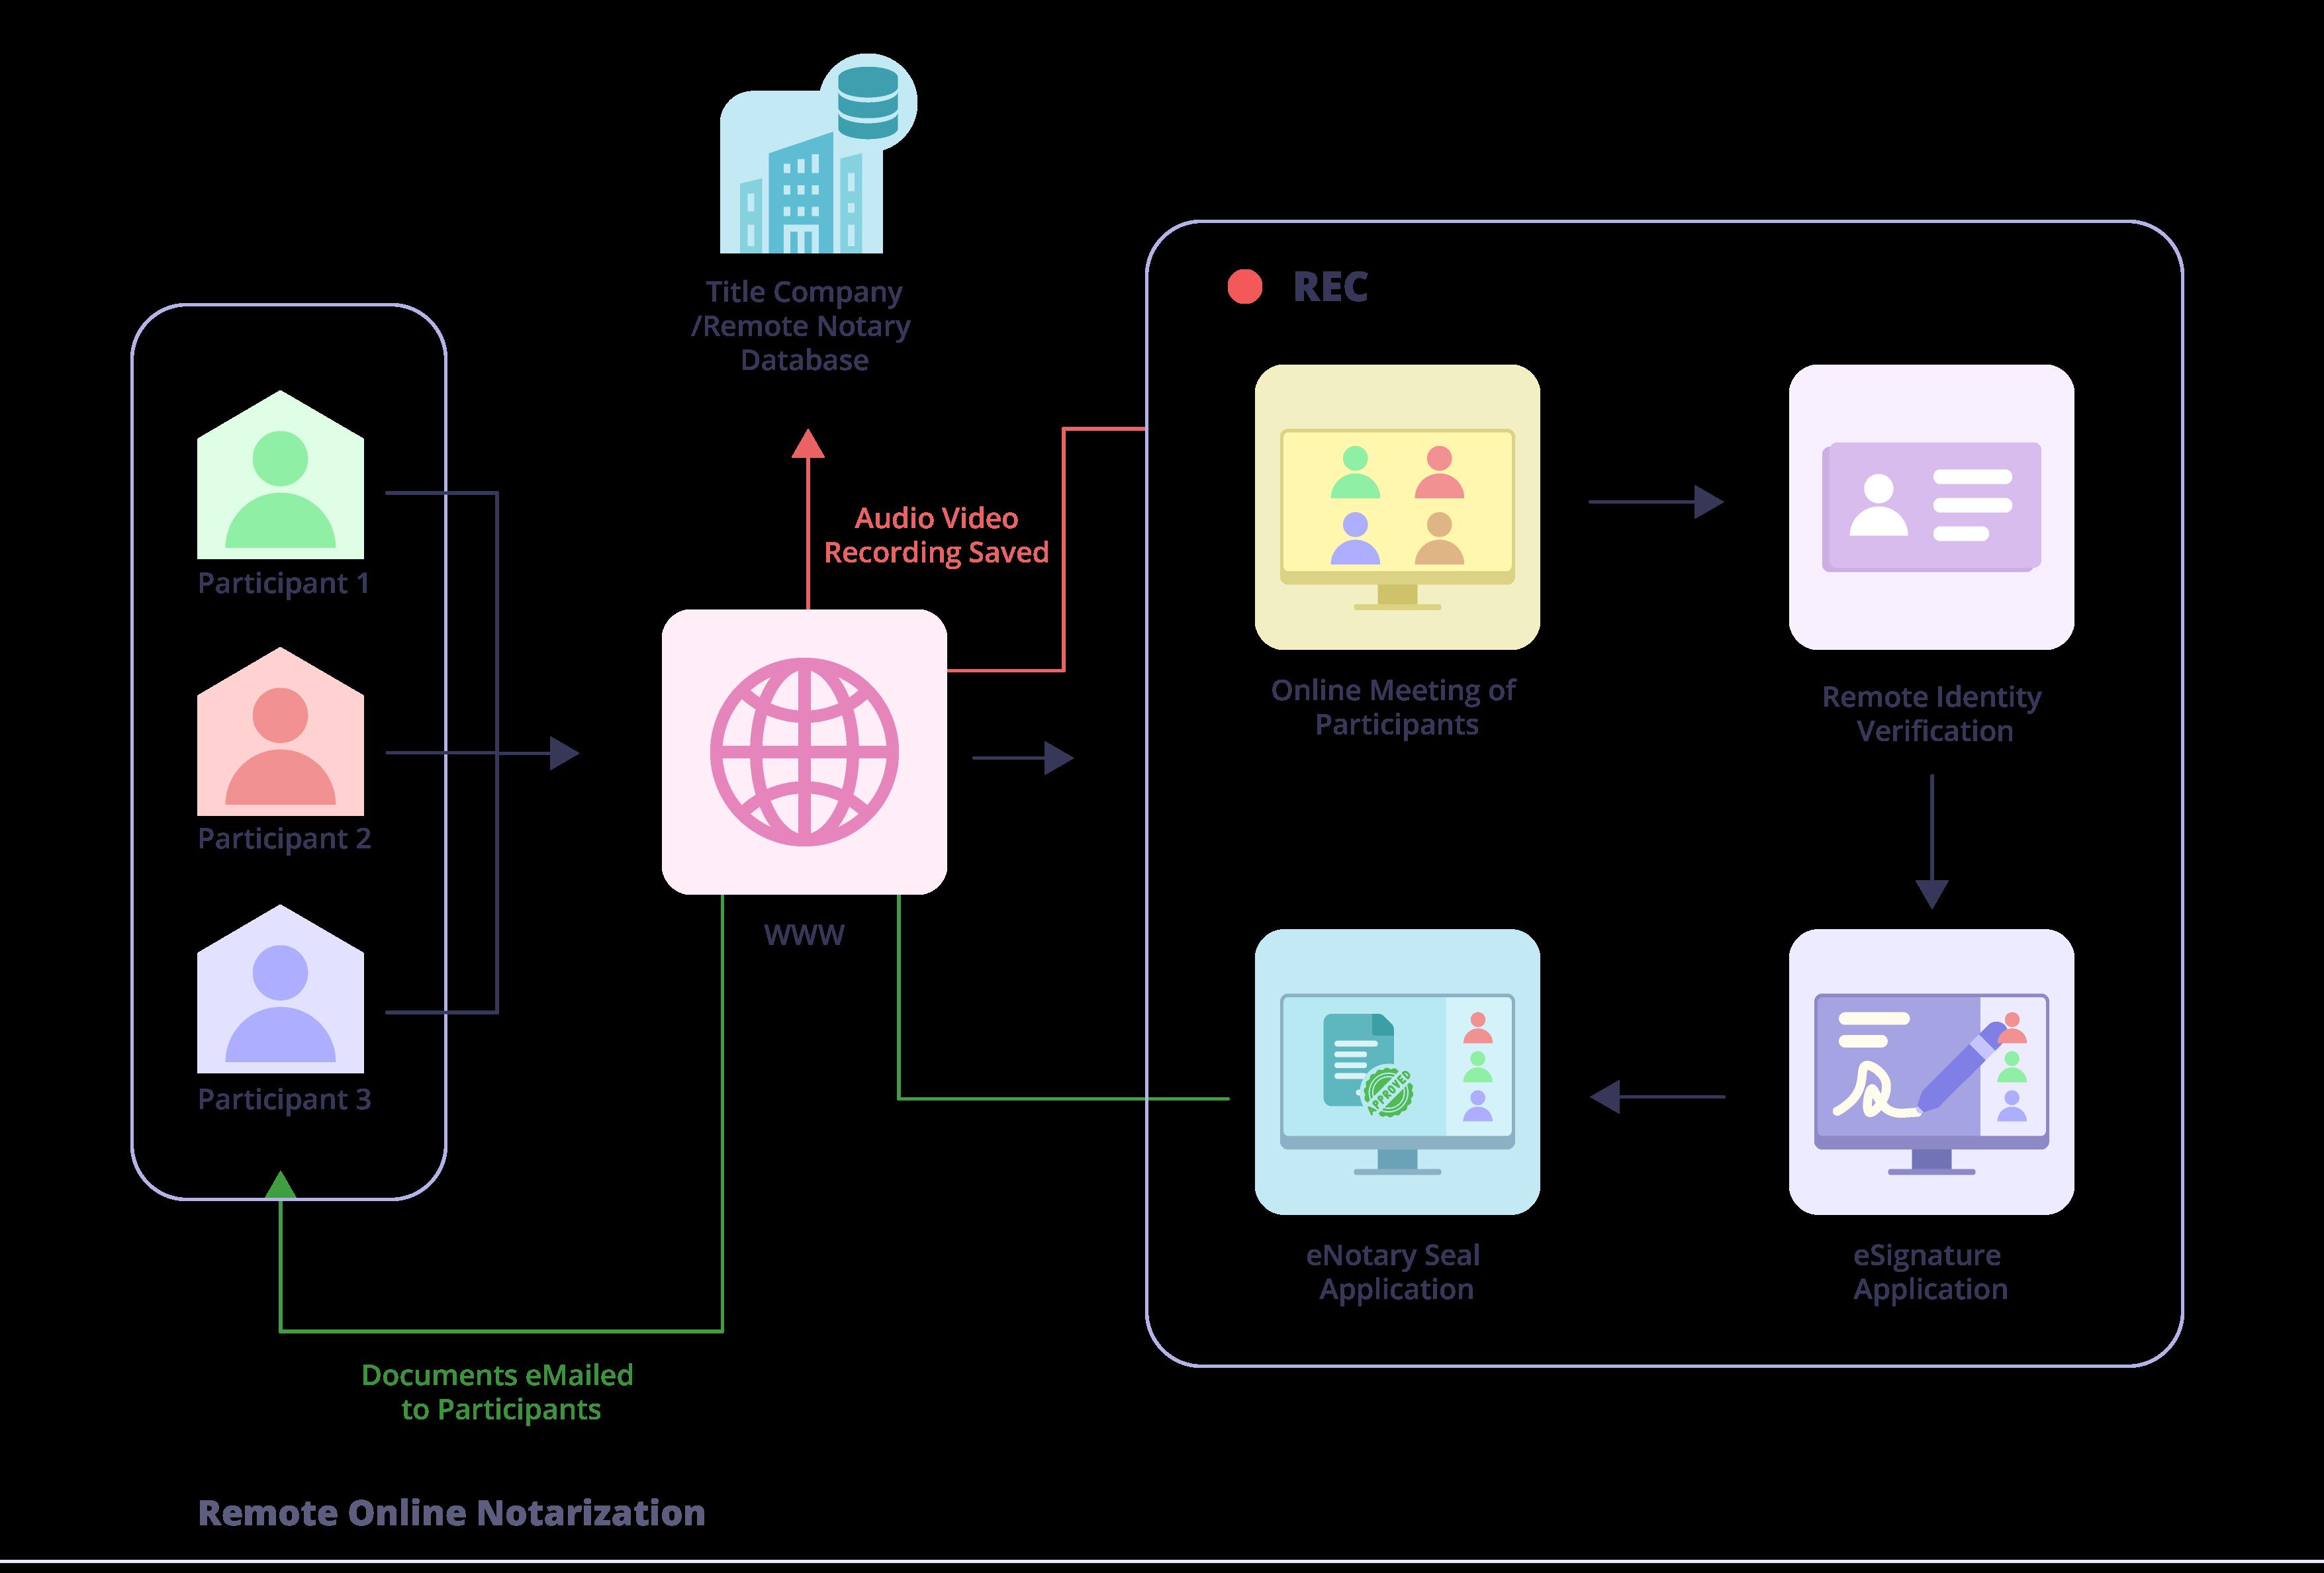 remote online notarization process